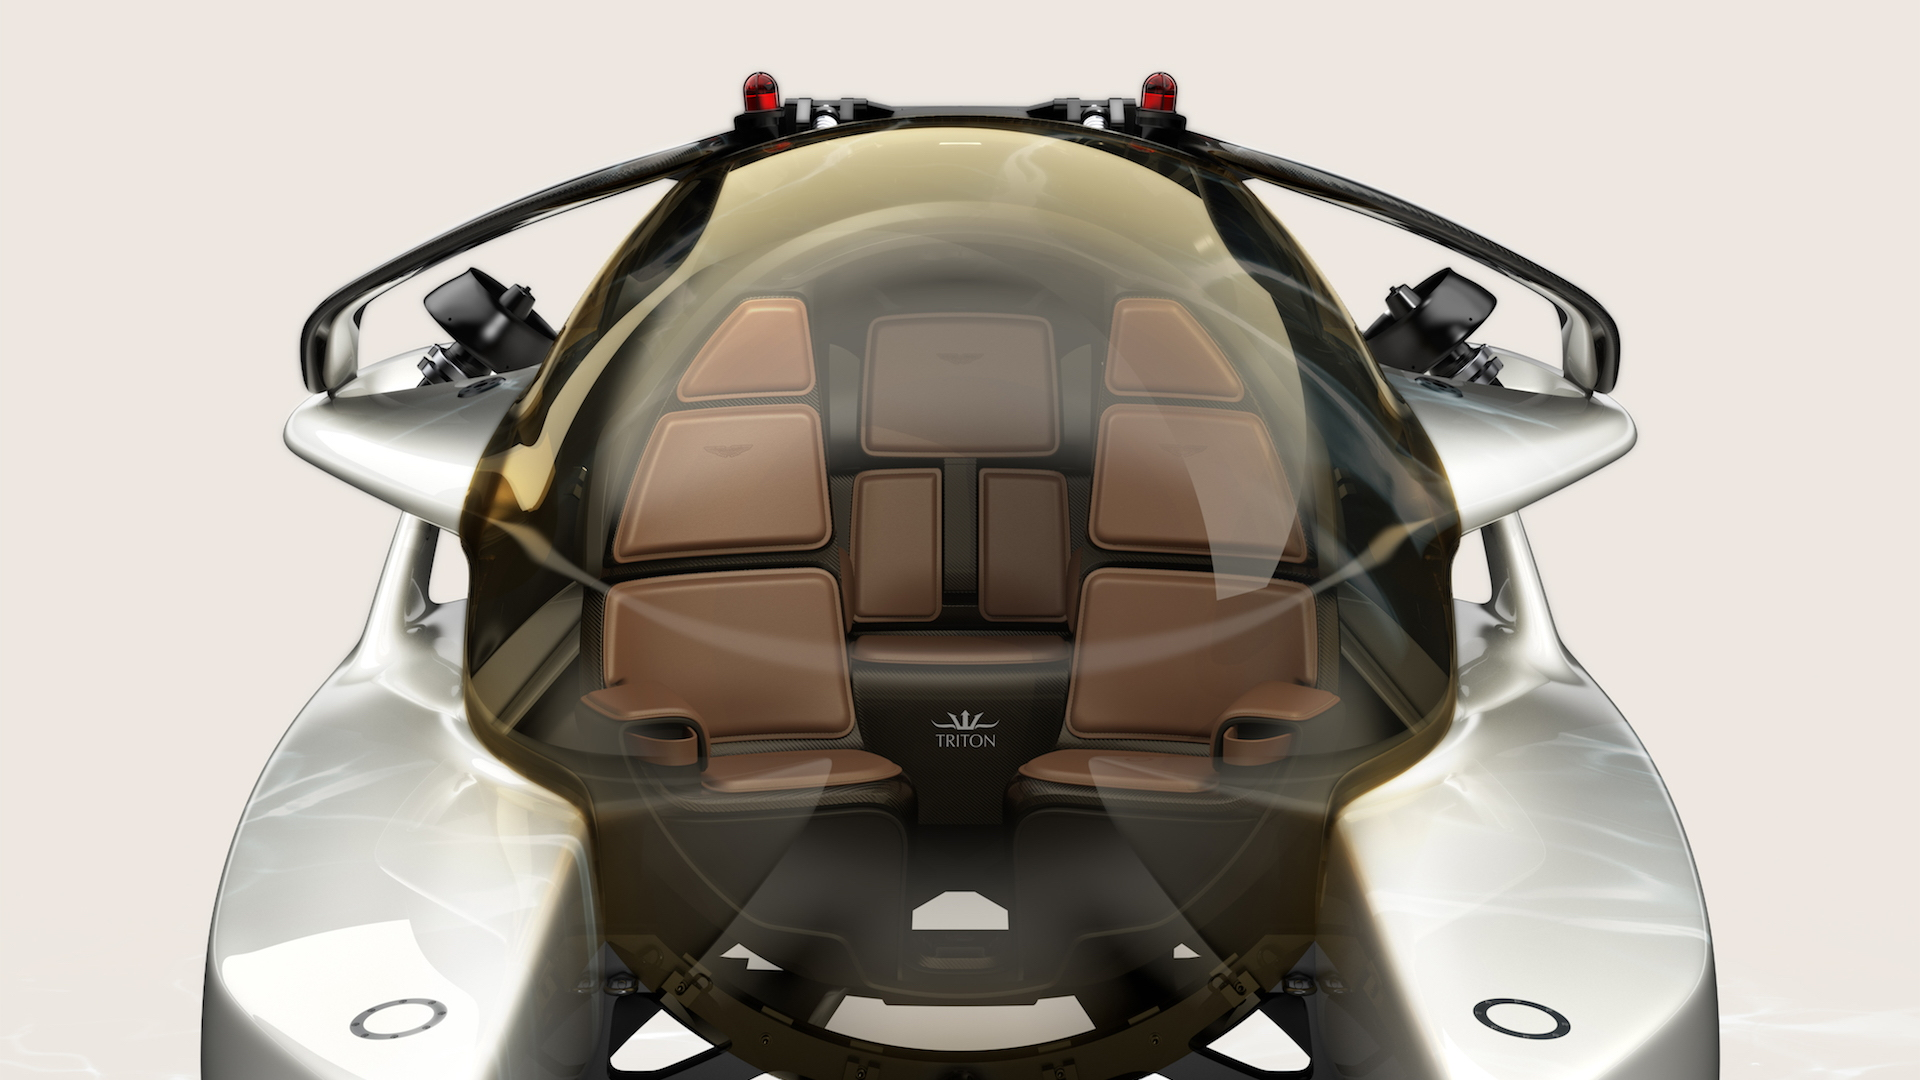 Aston Martin and Triton's Project Neptune submersible